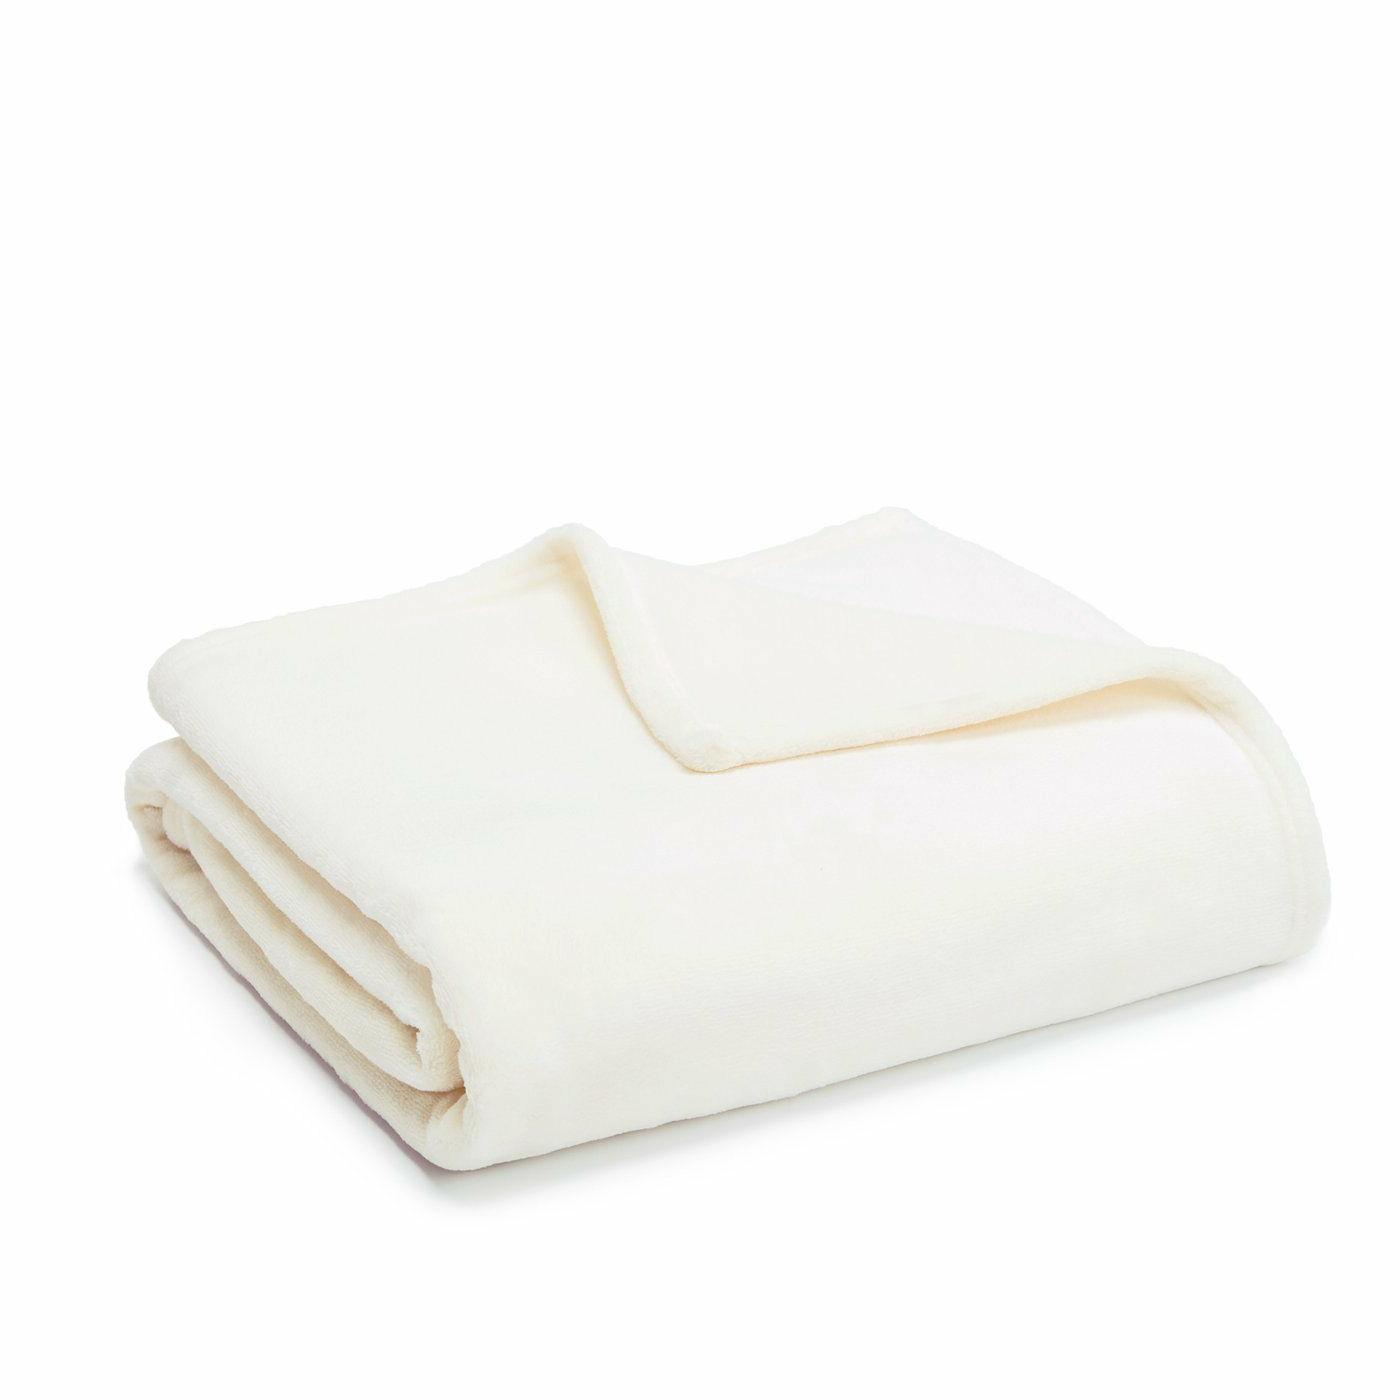 blanket flannel fleece luxury lightweight soft cozy